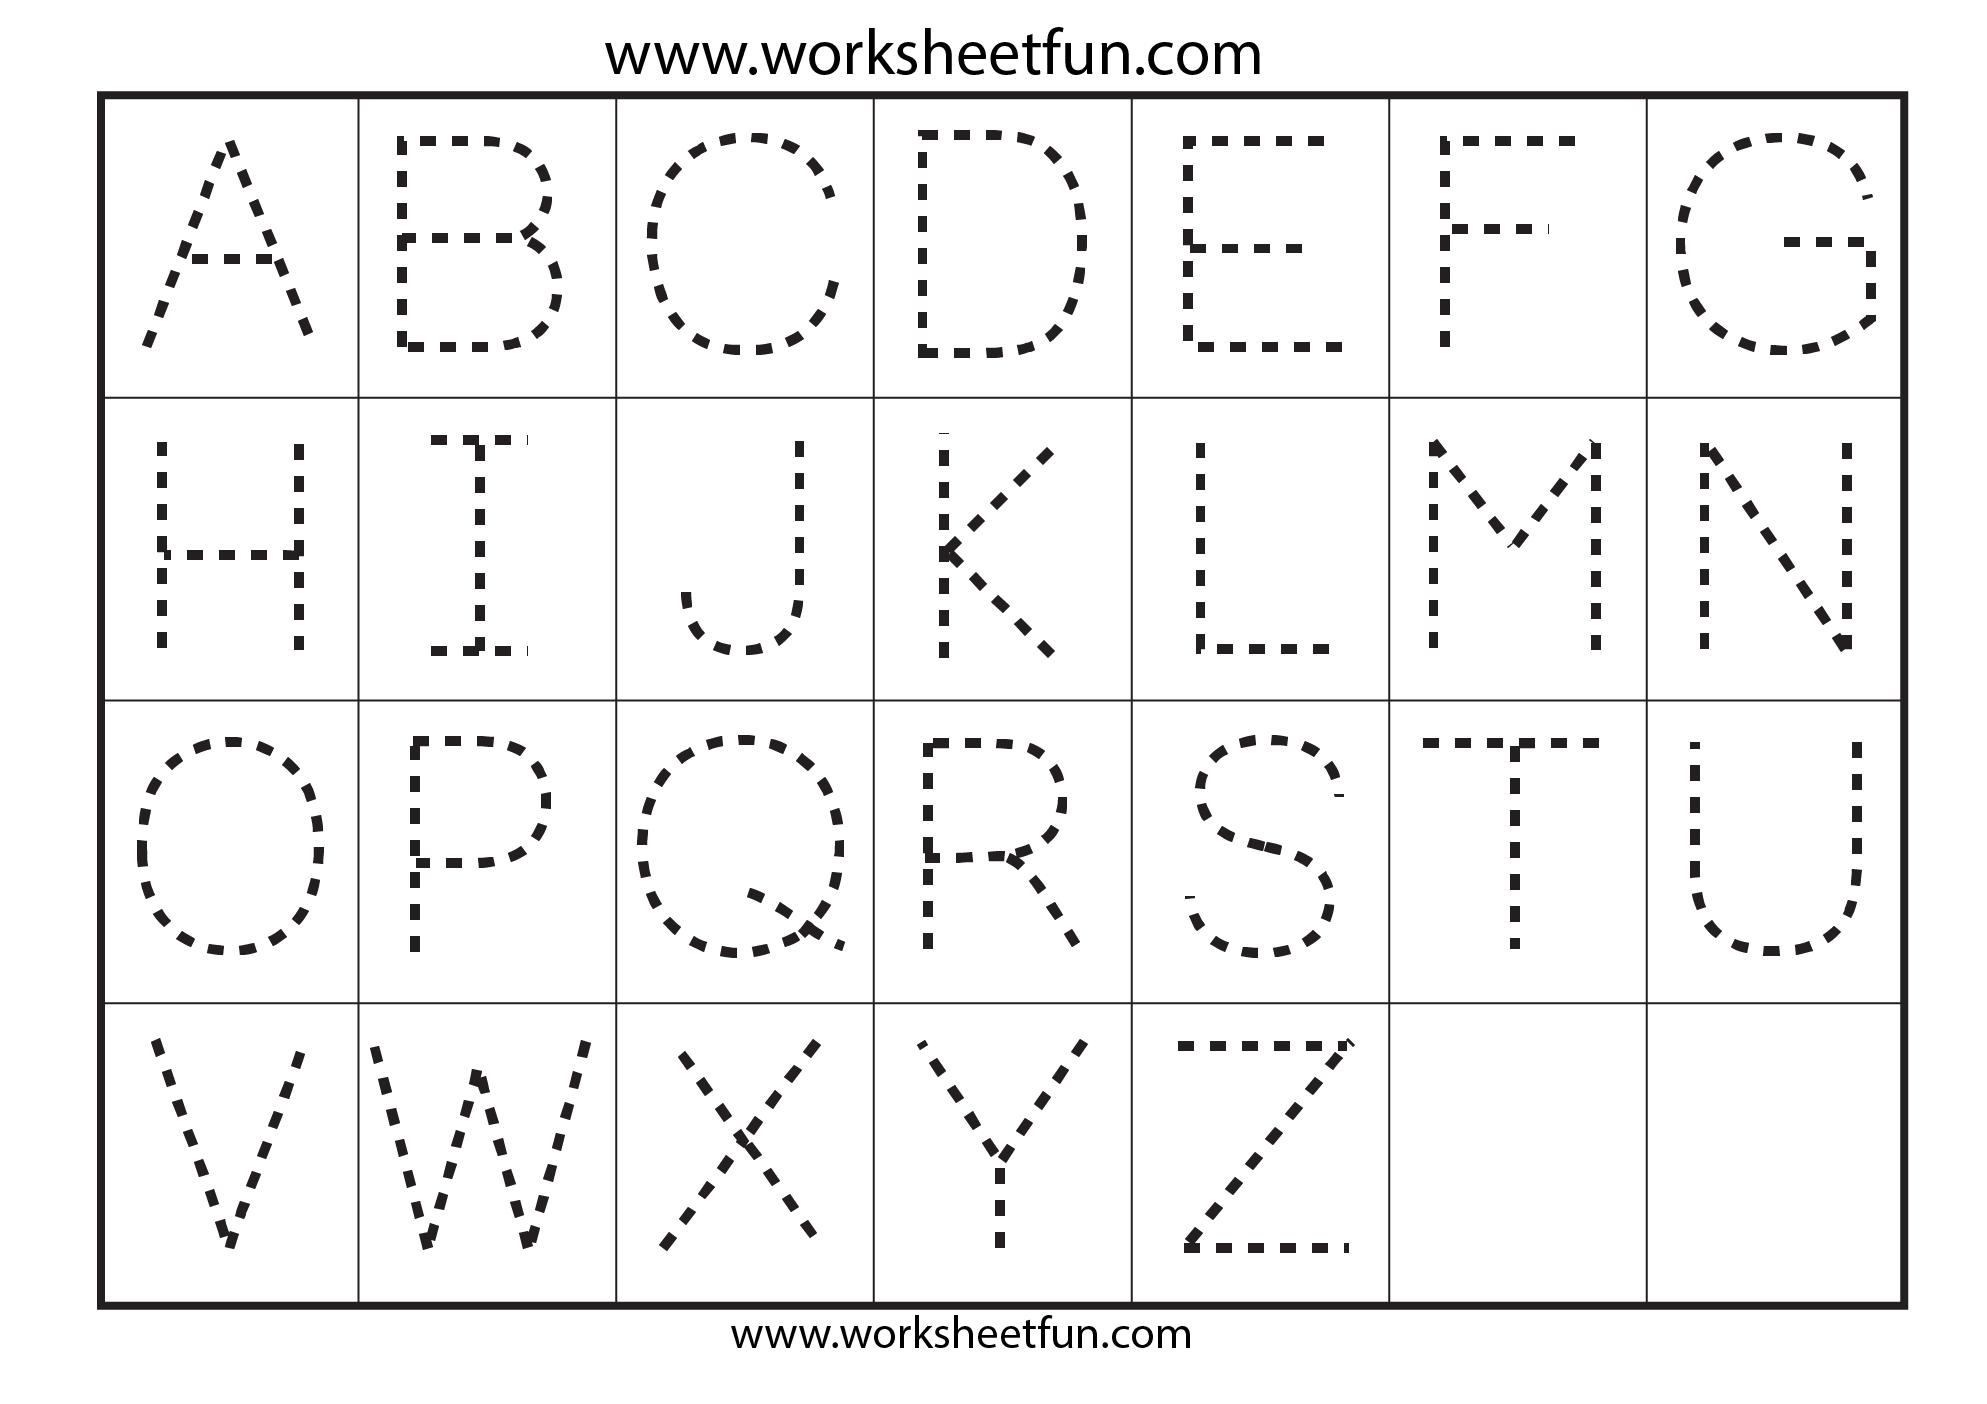 Preschool Worksheets Alphabet Tracing Letter A | Printable with Pre K Tracing Letters Worksheets